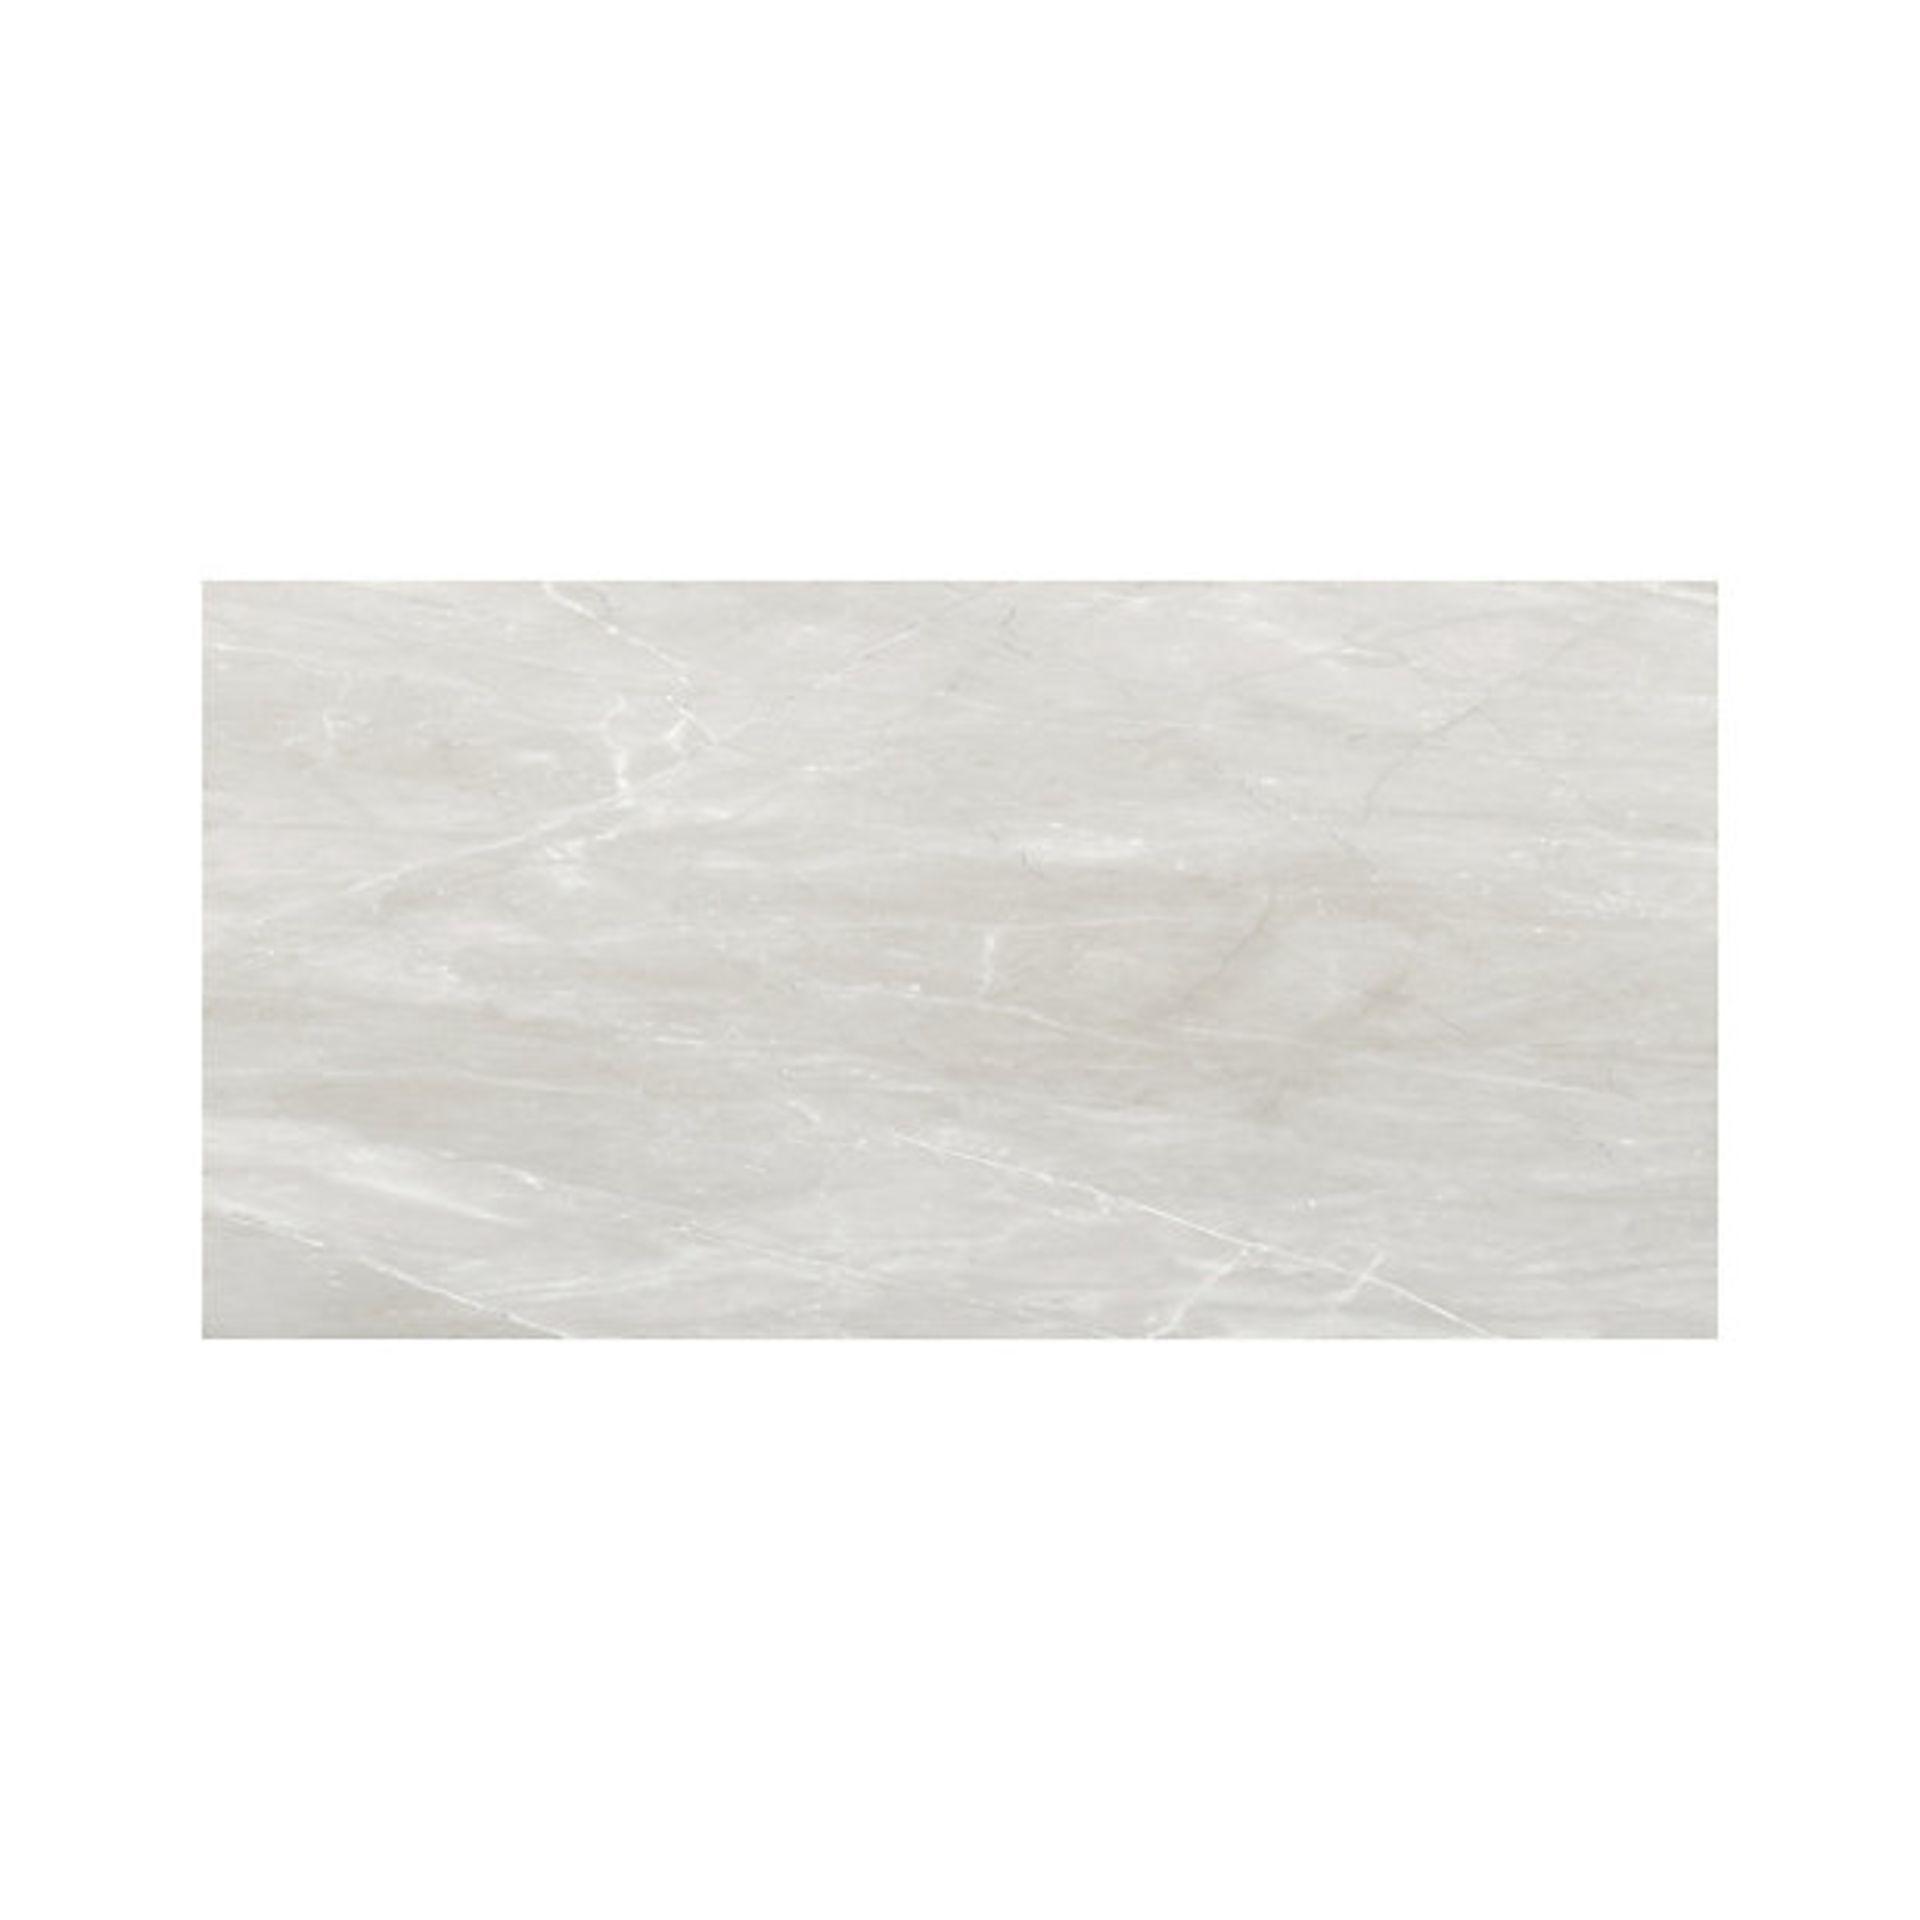 NEW 30.24m2 Killington Light Grey Matt Marble effect Ceramic Floor tile. Room use: Any room, - Image 2 of 2